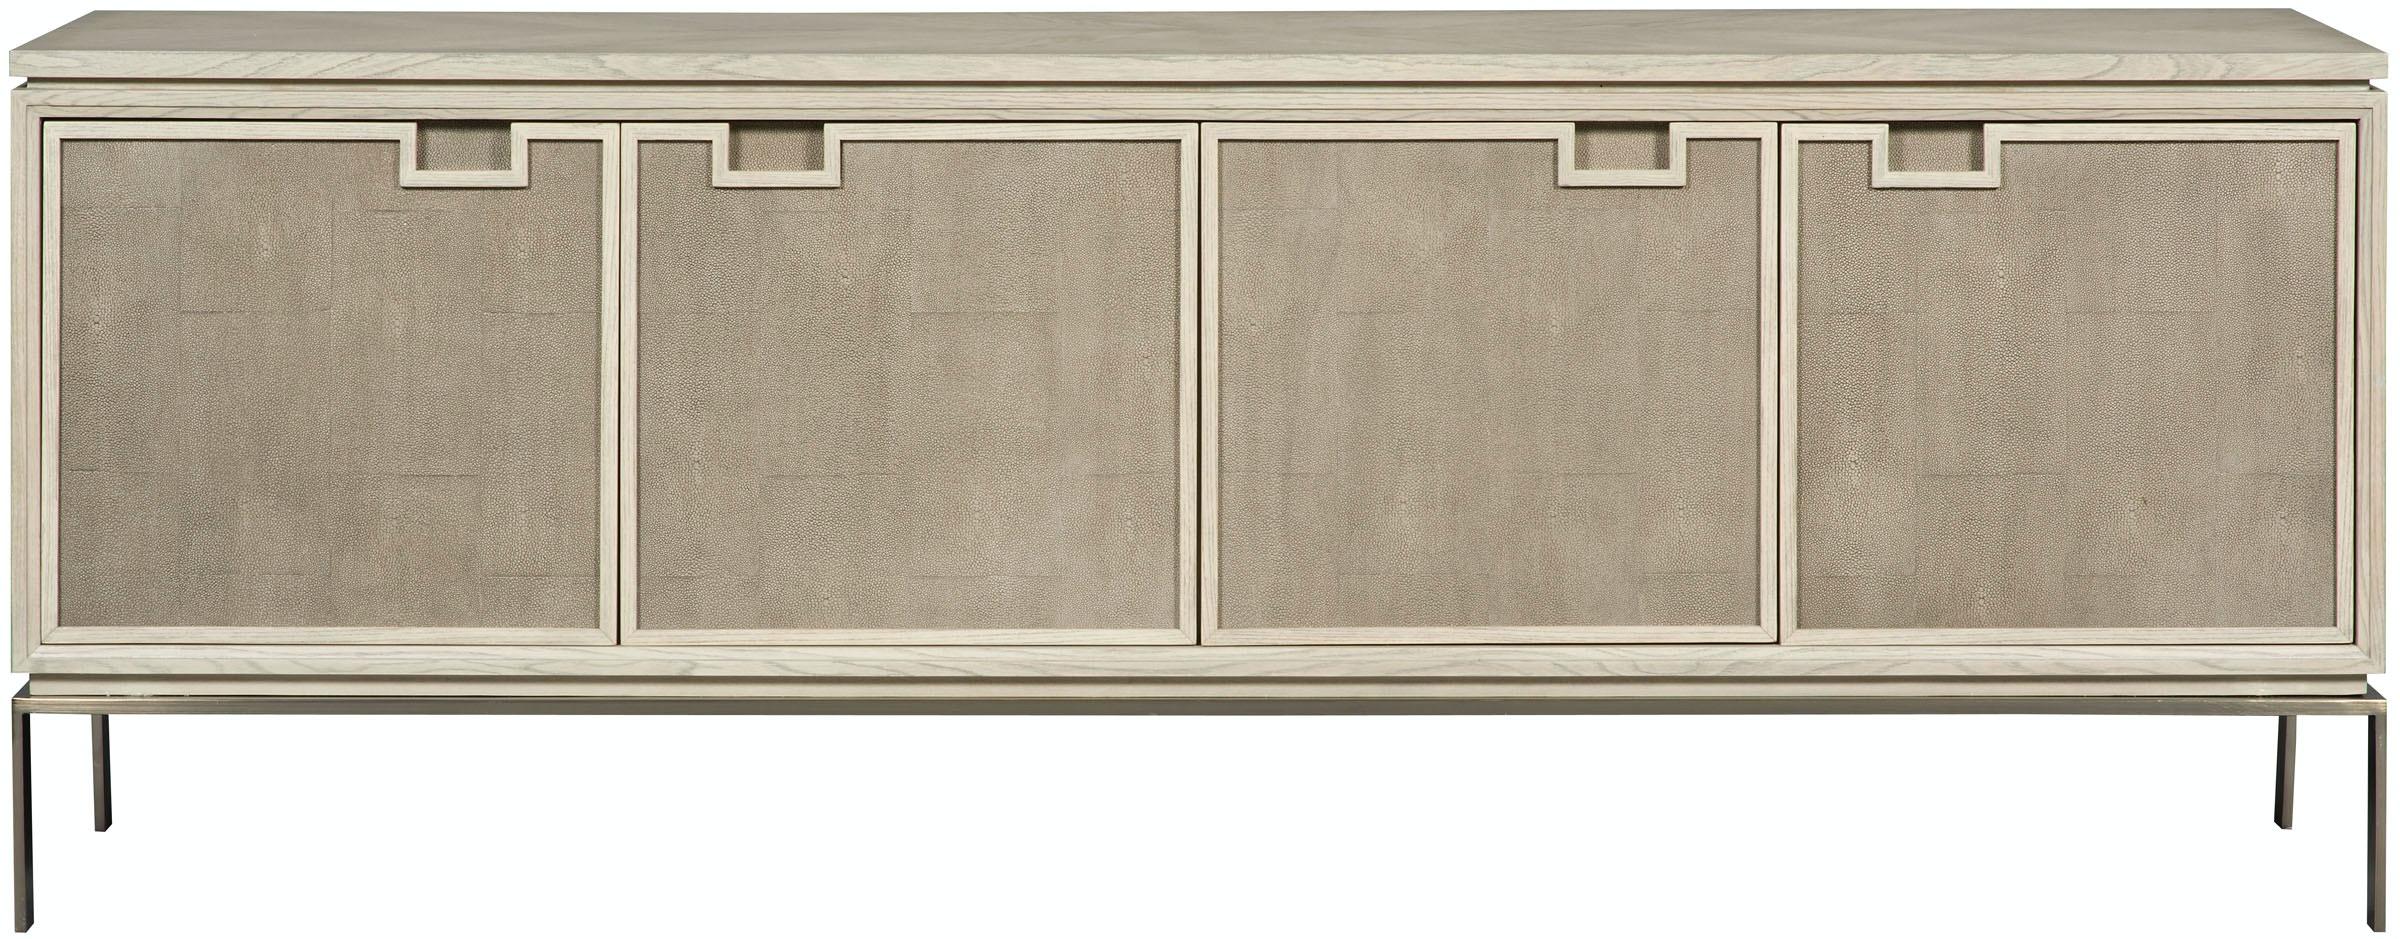 Vanguard Furniture W777b Dining Room Michael Weiss Stonington Sideboard